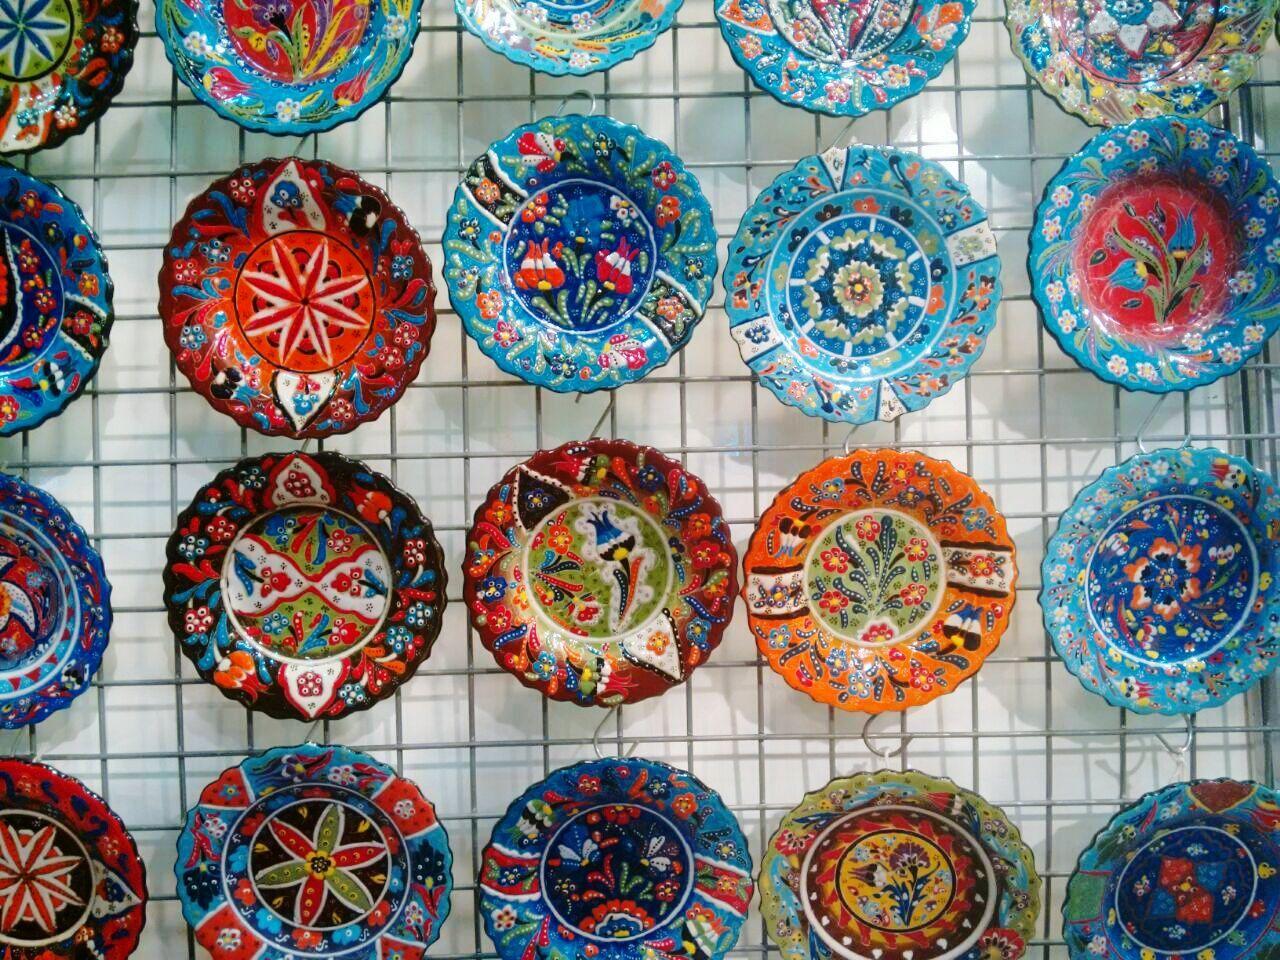 🌸🌸🌸 Beautifully Organized Abundance Day Cultures Beautiful Beauty Simplicity Art Art Gallery Craft Crafts EyeEm Gallery EyeEmBestPics EyeEm Best Shots I LOVE PHOTOGRAPHY Colors Colorful Brazilian Gallery Brasil Brazil 🌸🌻💋🌻🌸🌏✌